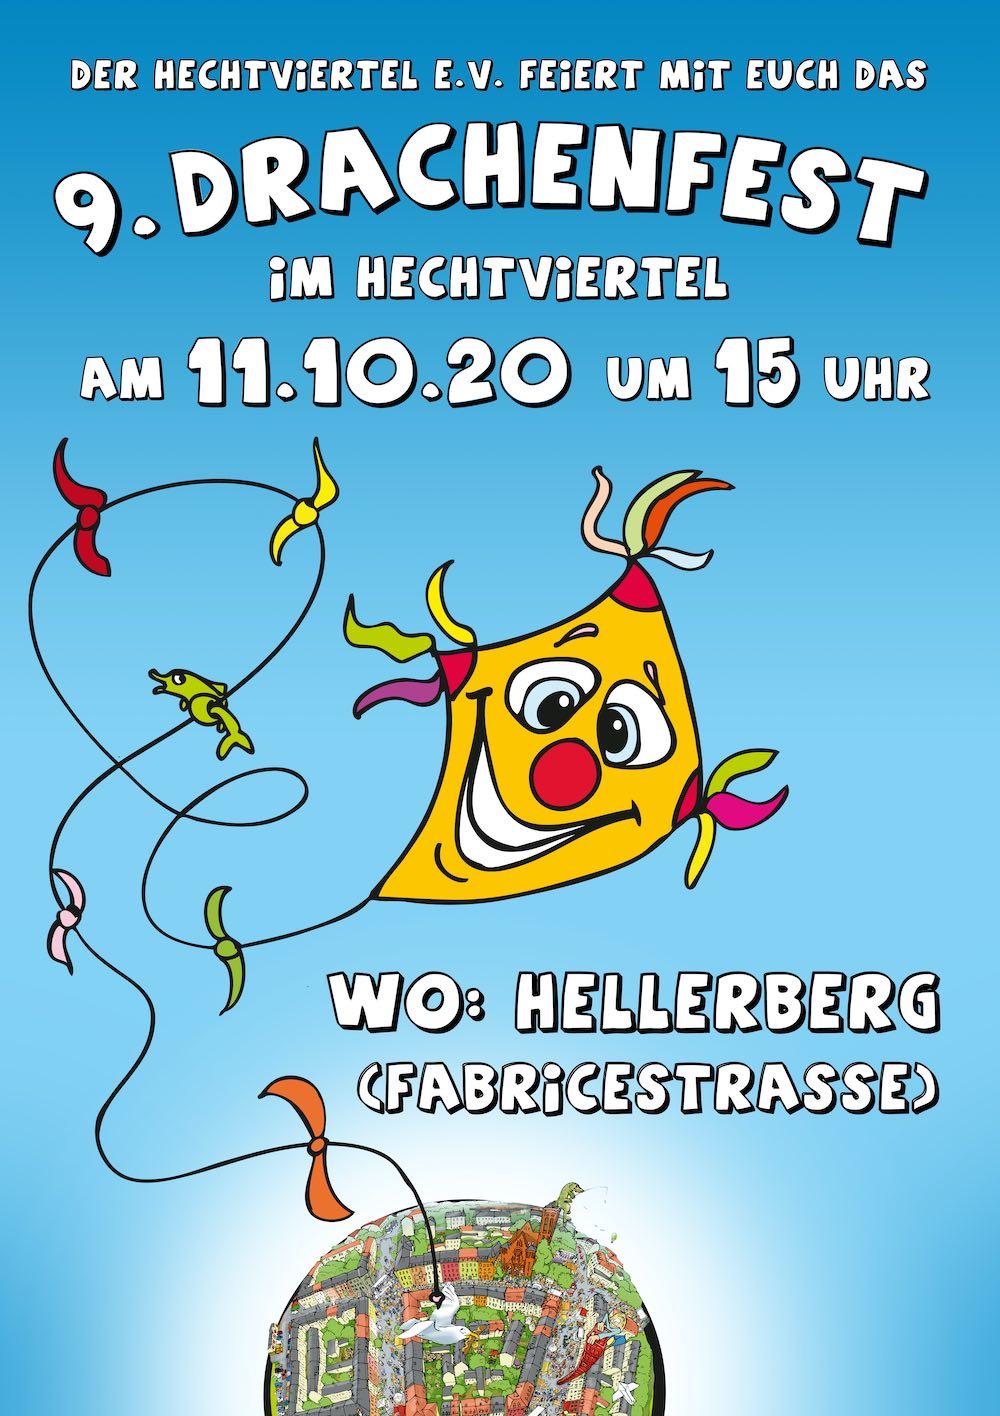 Plakat Drachenfest 2020 auf dem Hellerberg